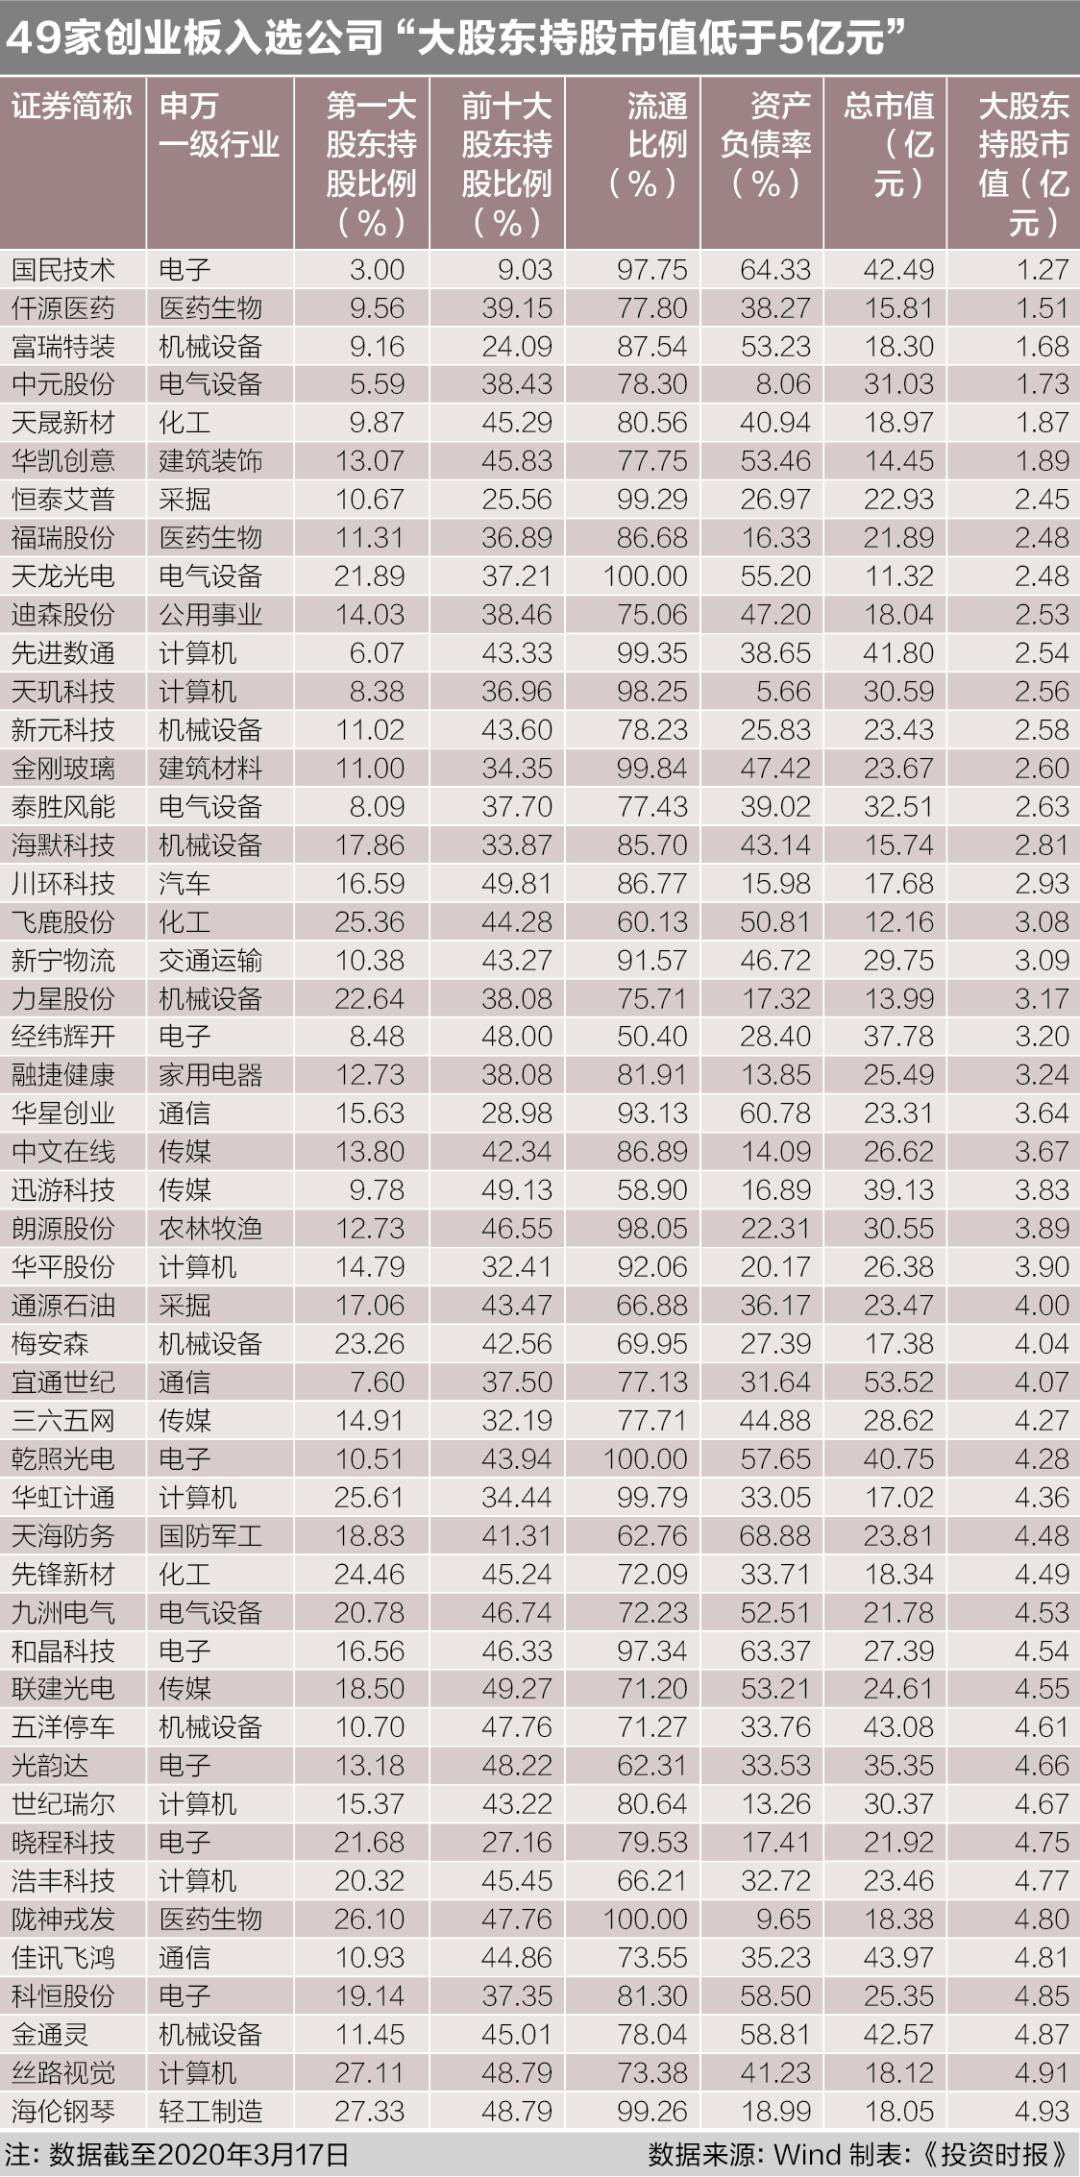 A股上市公司2020并购指南:166家创业板公司进入样本 最小市值仅11.32亿